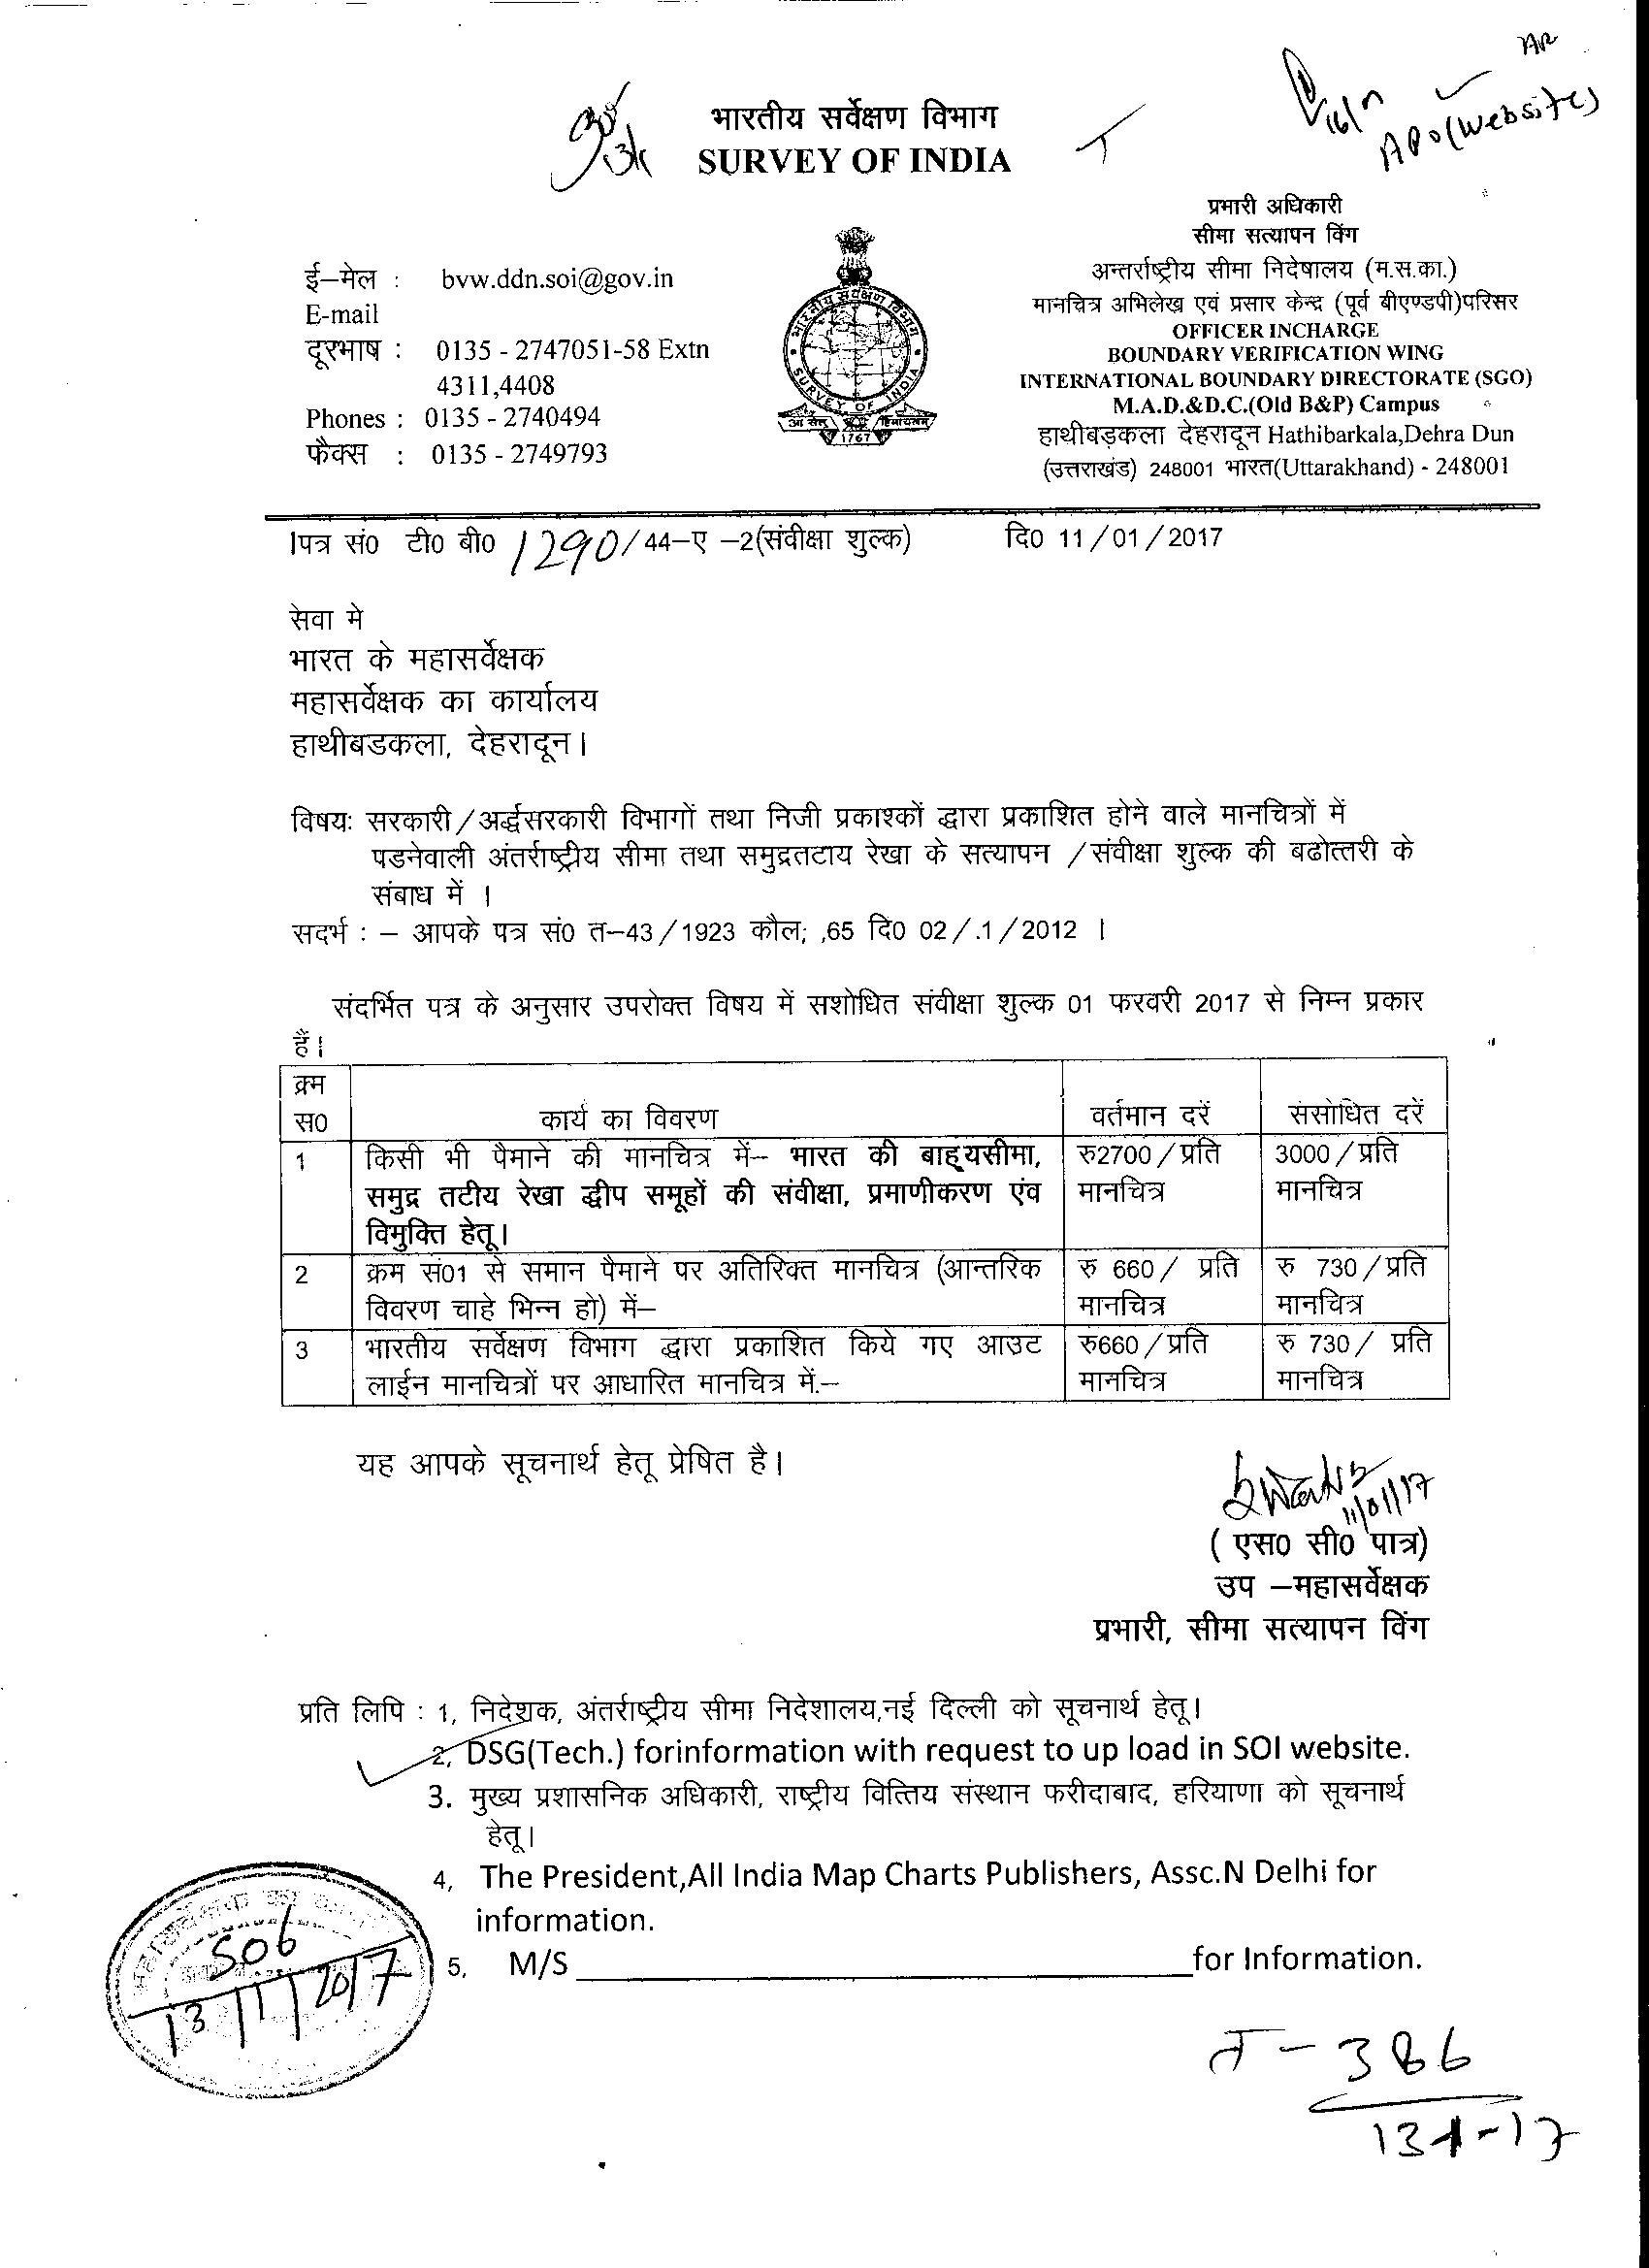 Gen Info: Survey of India